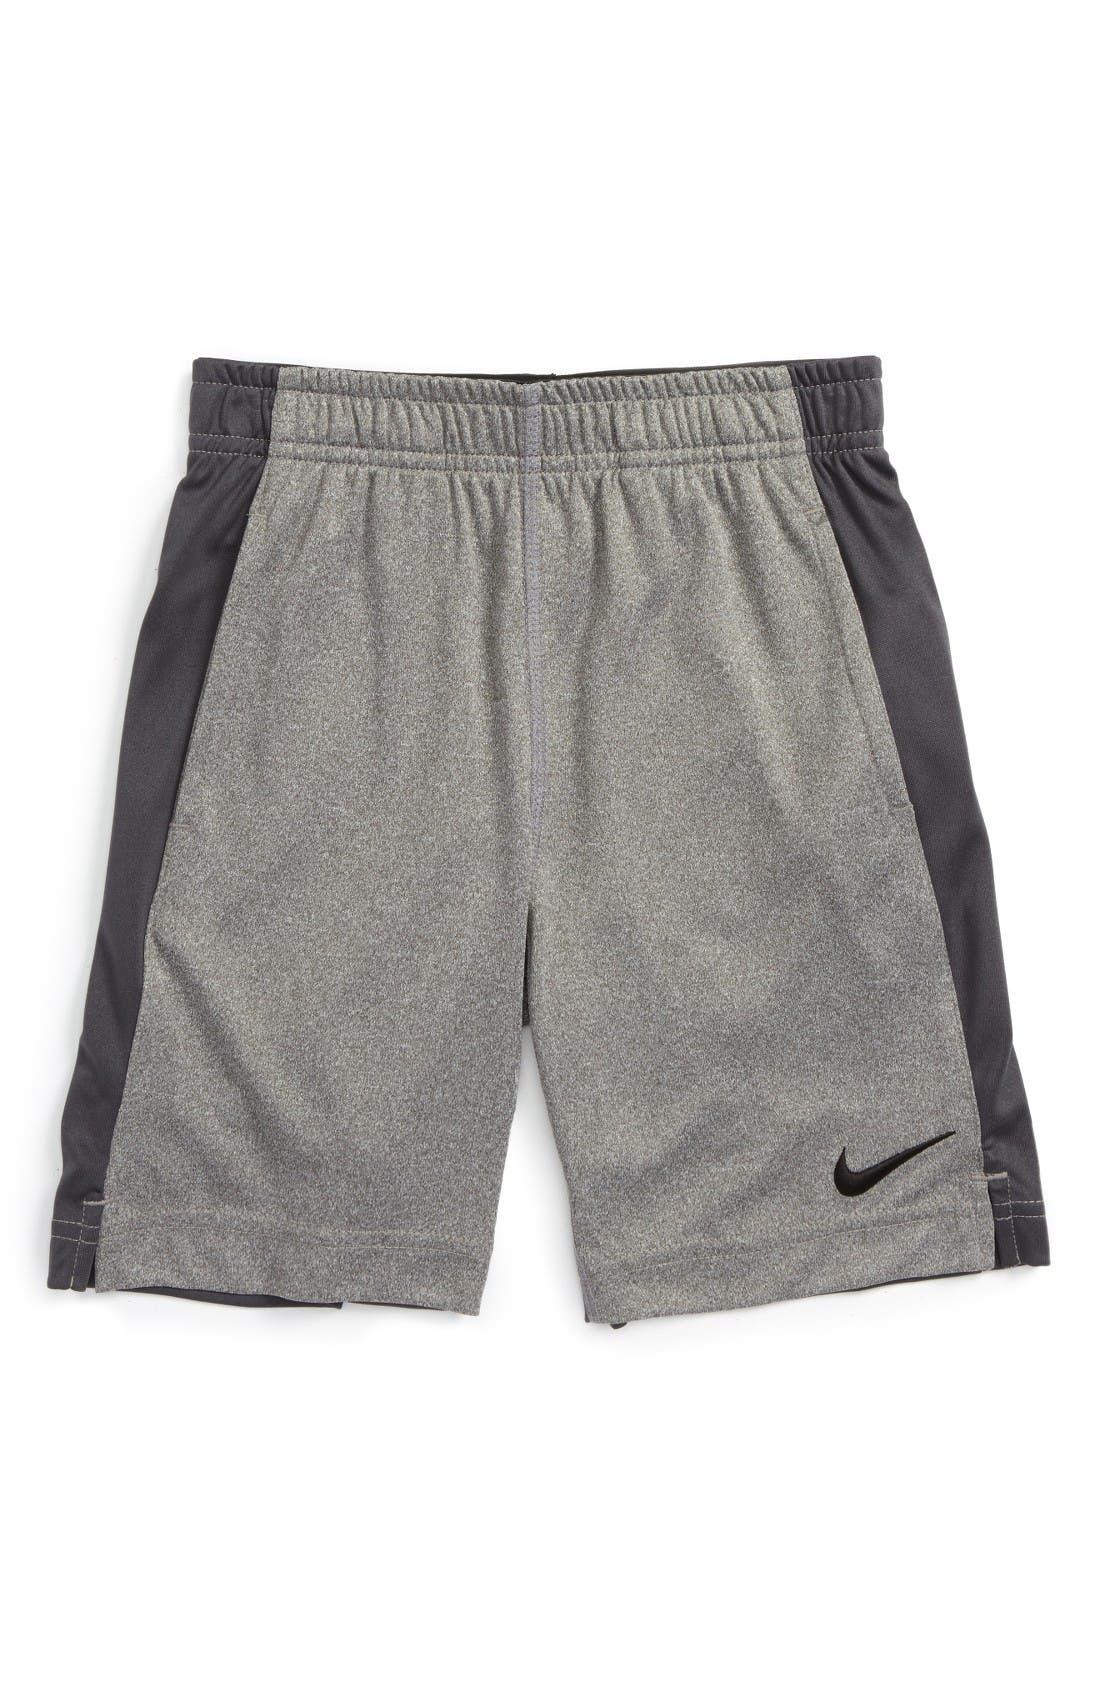 Nike Dri-FIT Shorts (Toddler Boys & Little Boys)